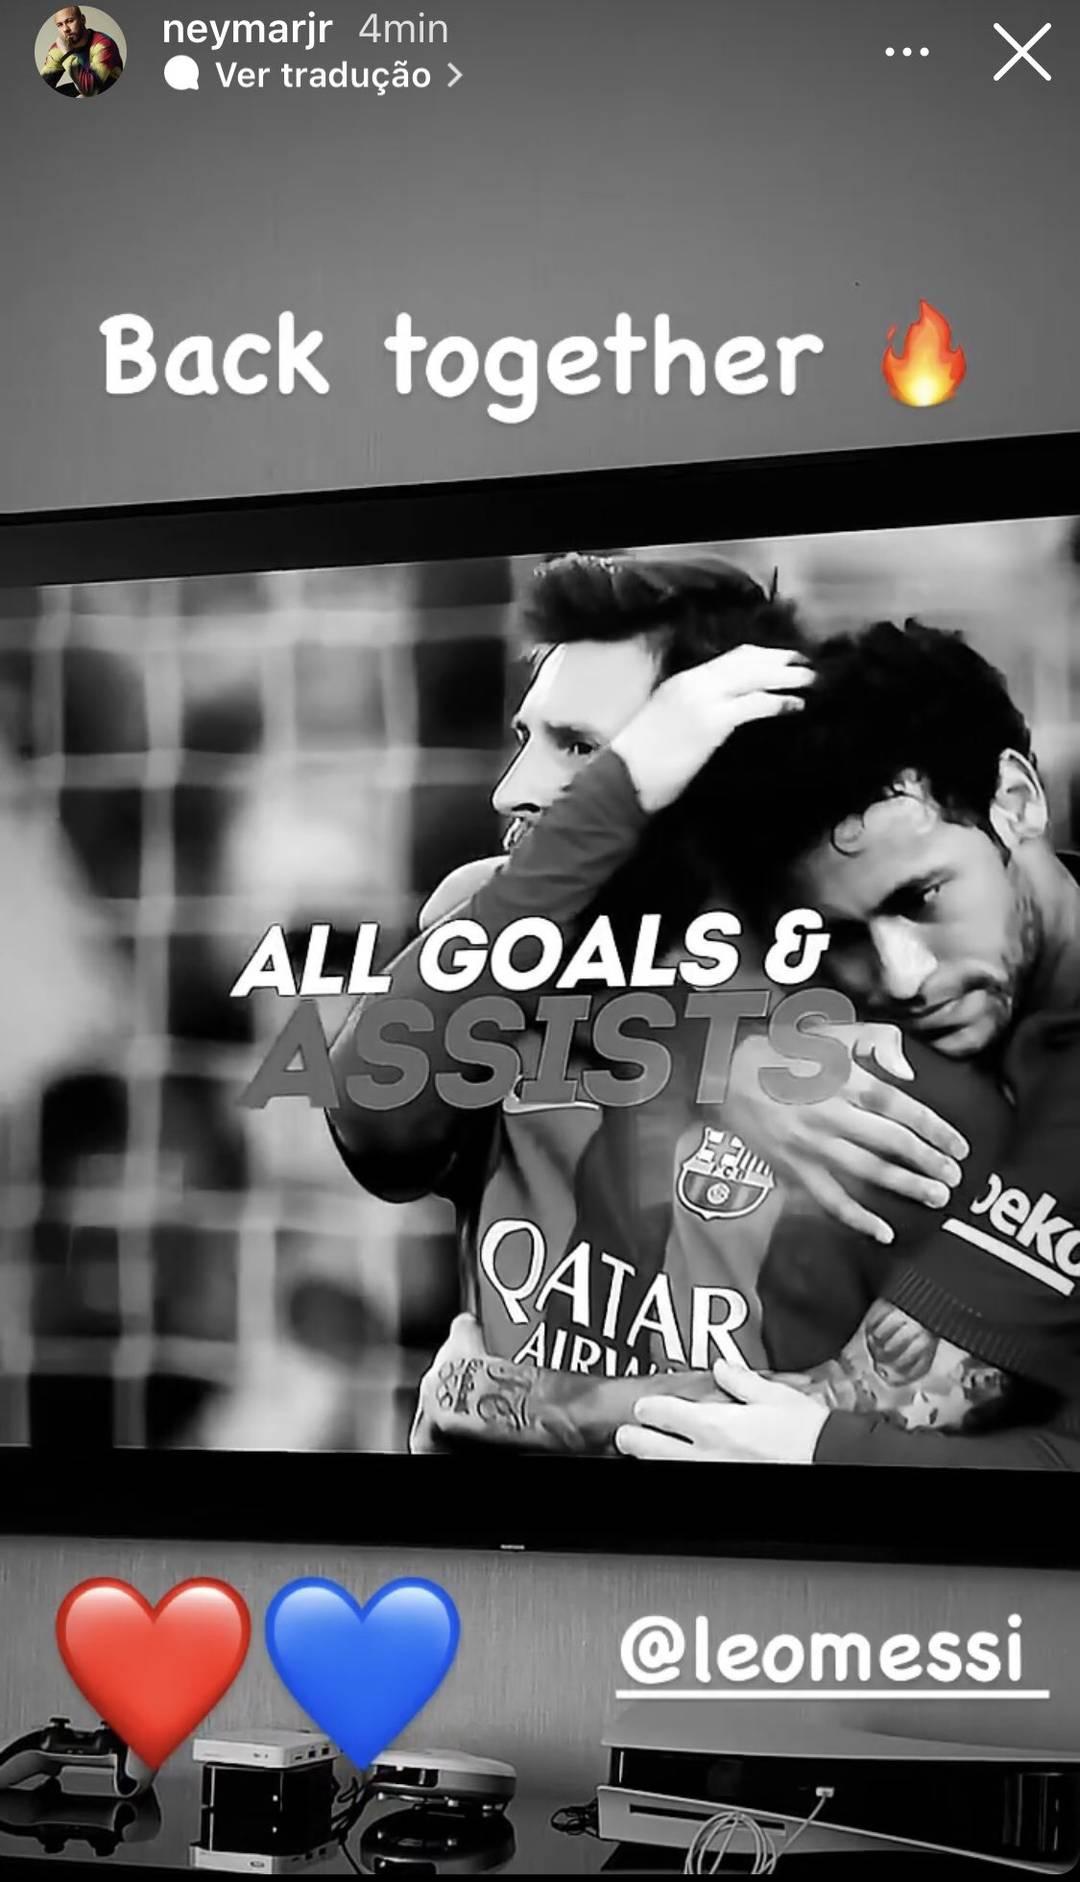 Neymar dá boas vindas Lionel Messi